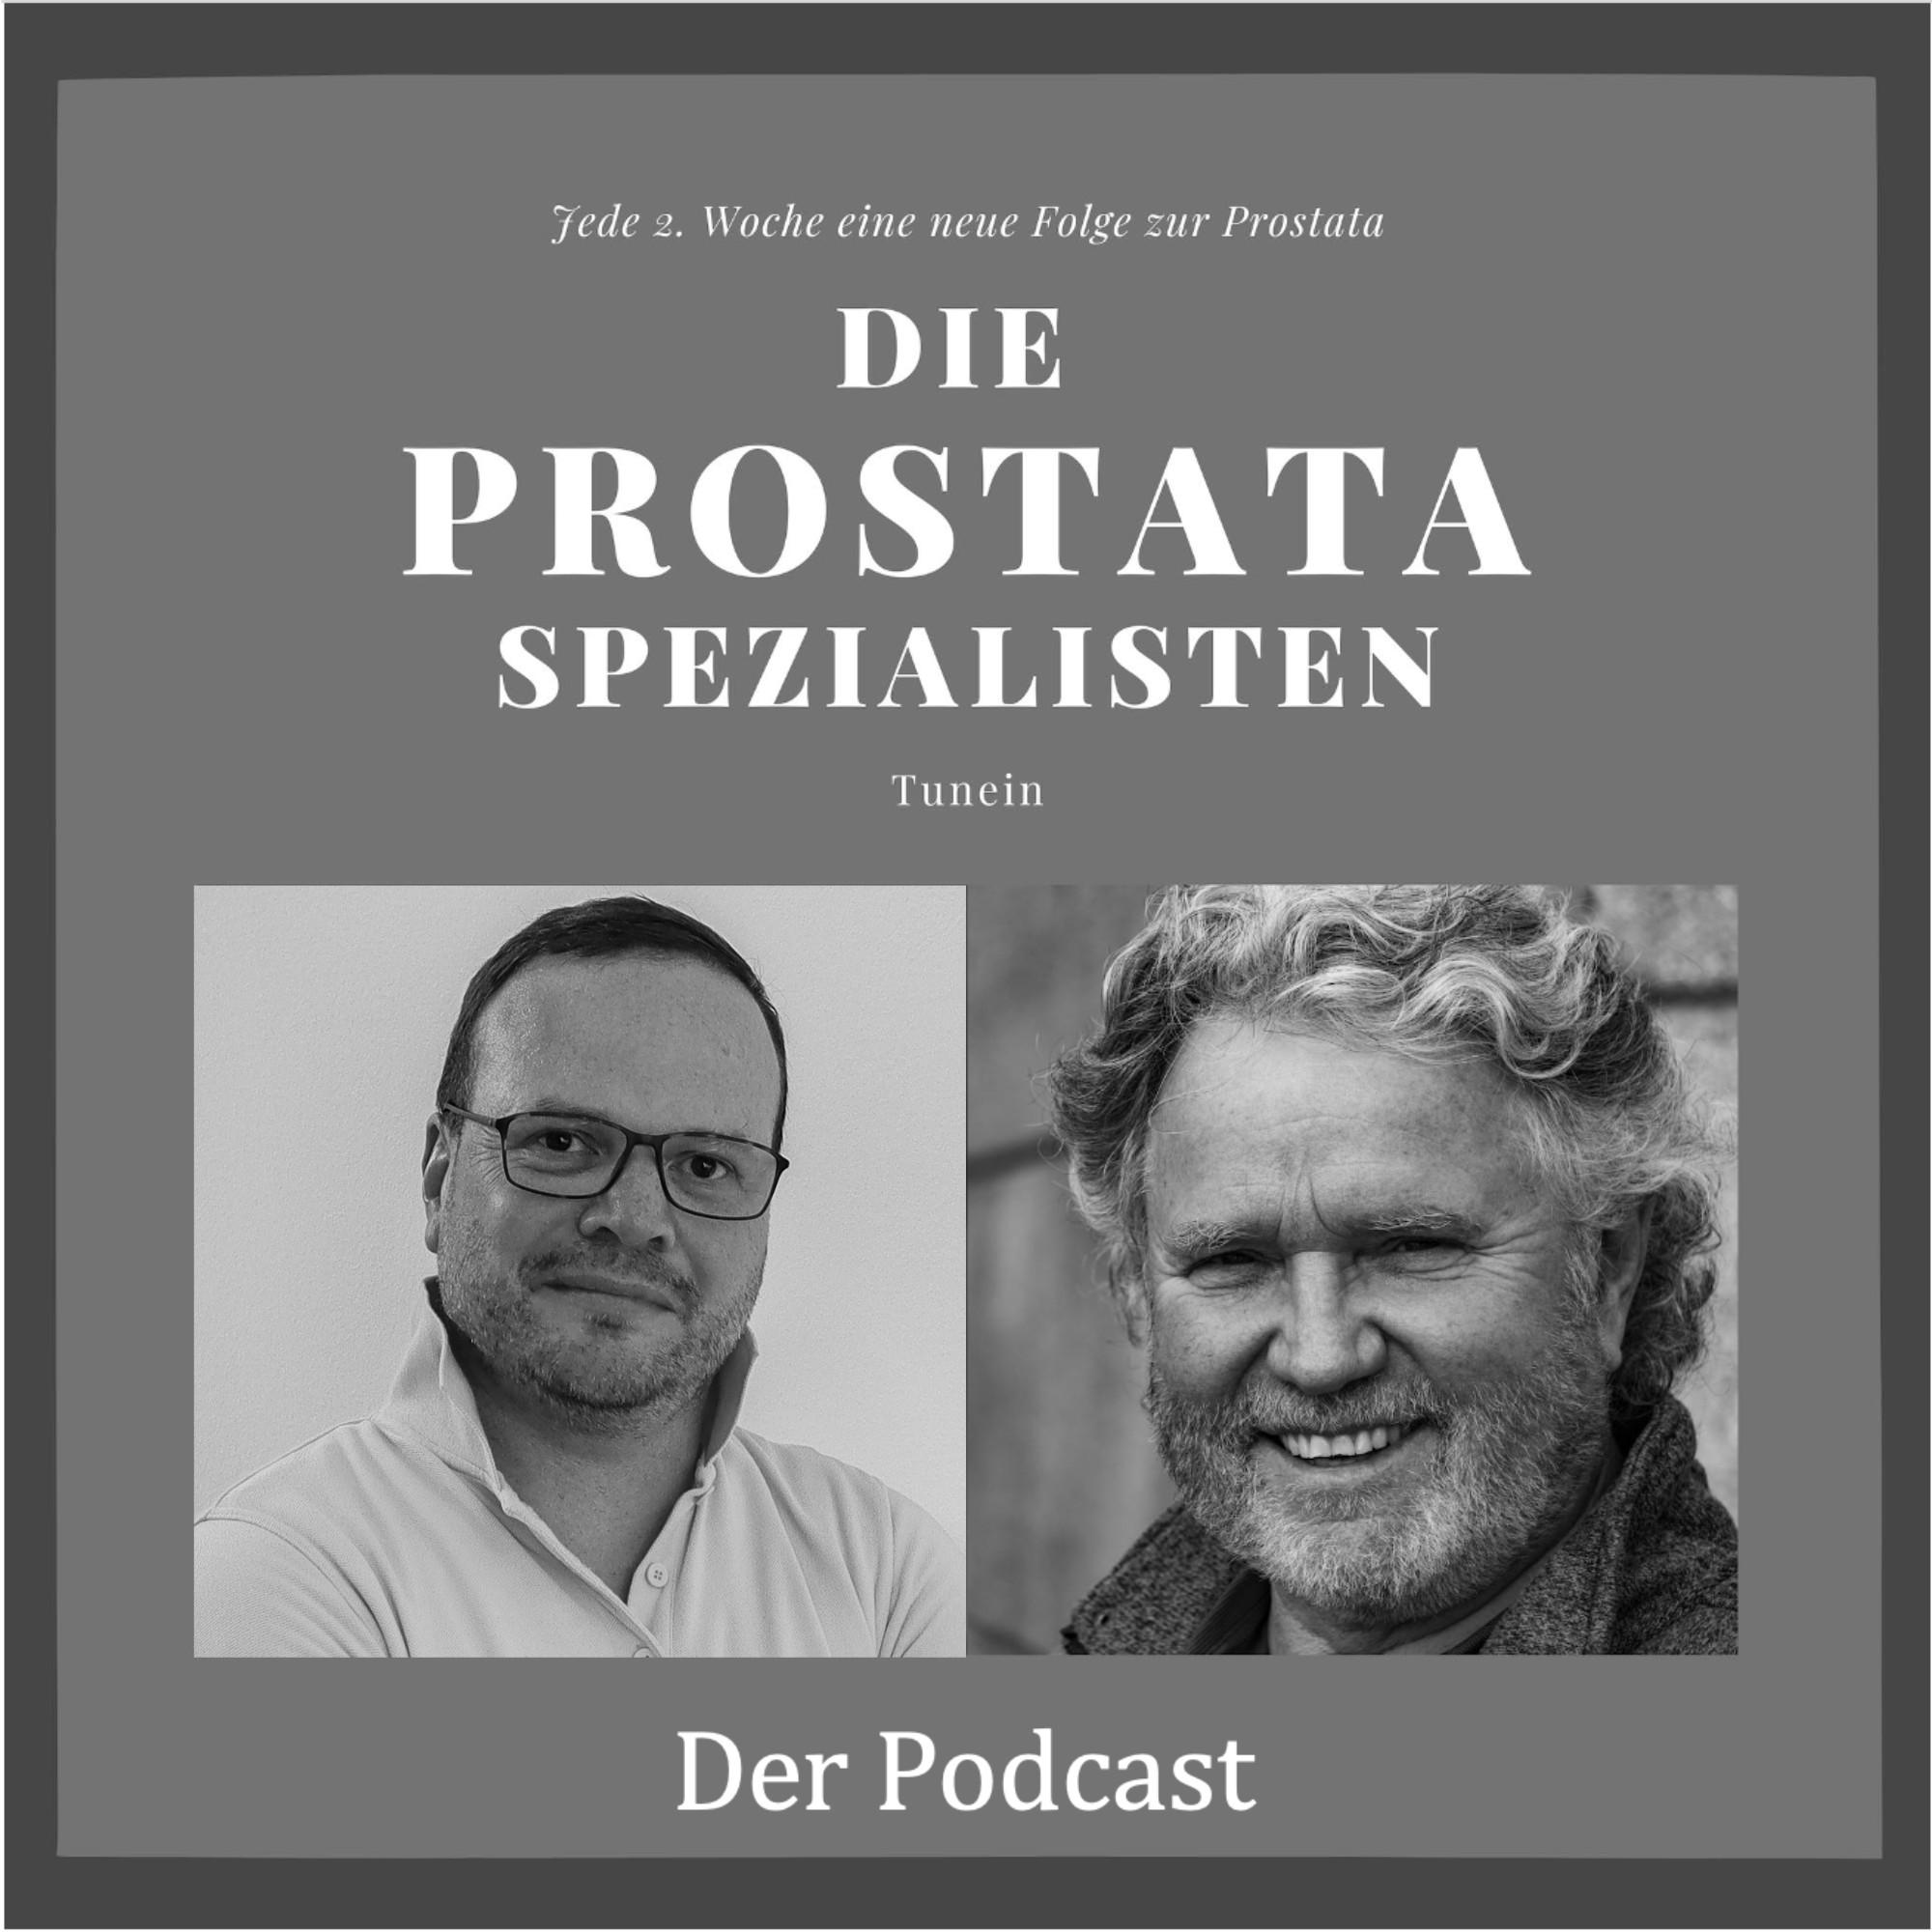 Artwork for podcast Die Prostata-Spezialisten